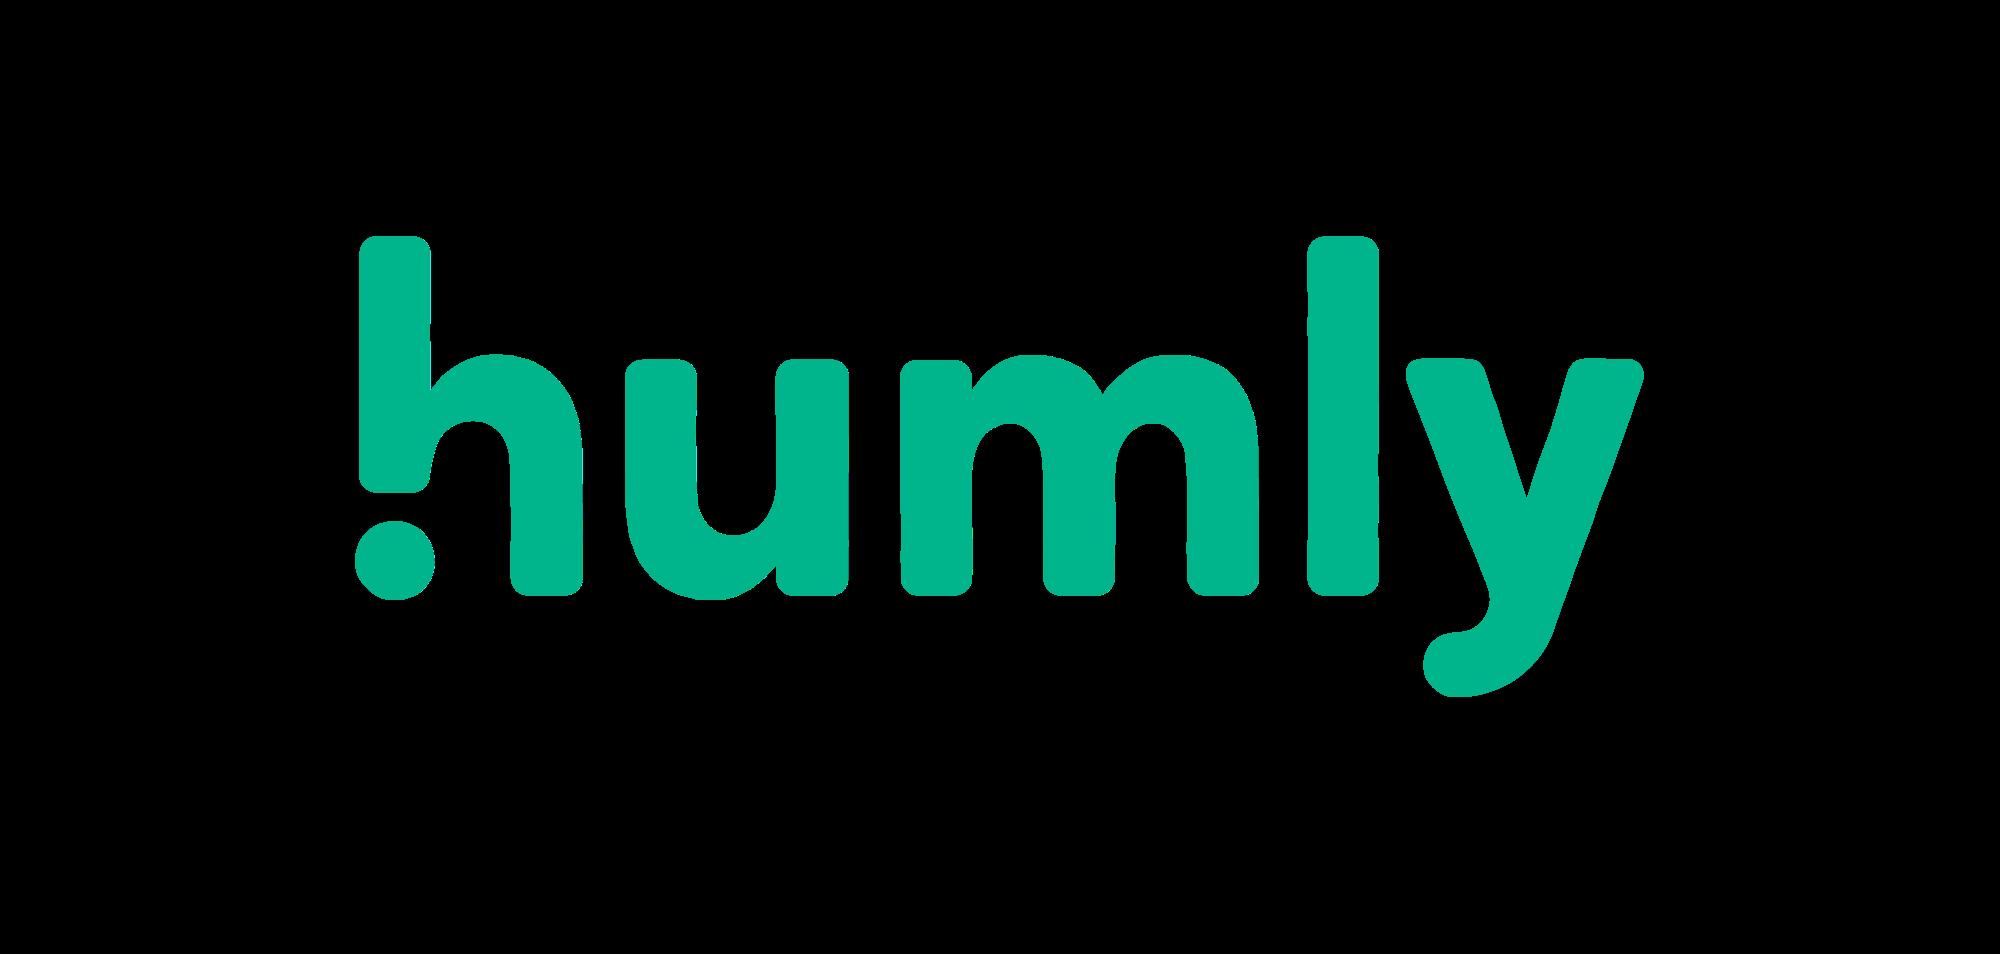 Humly